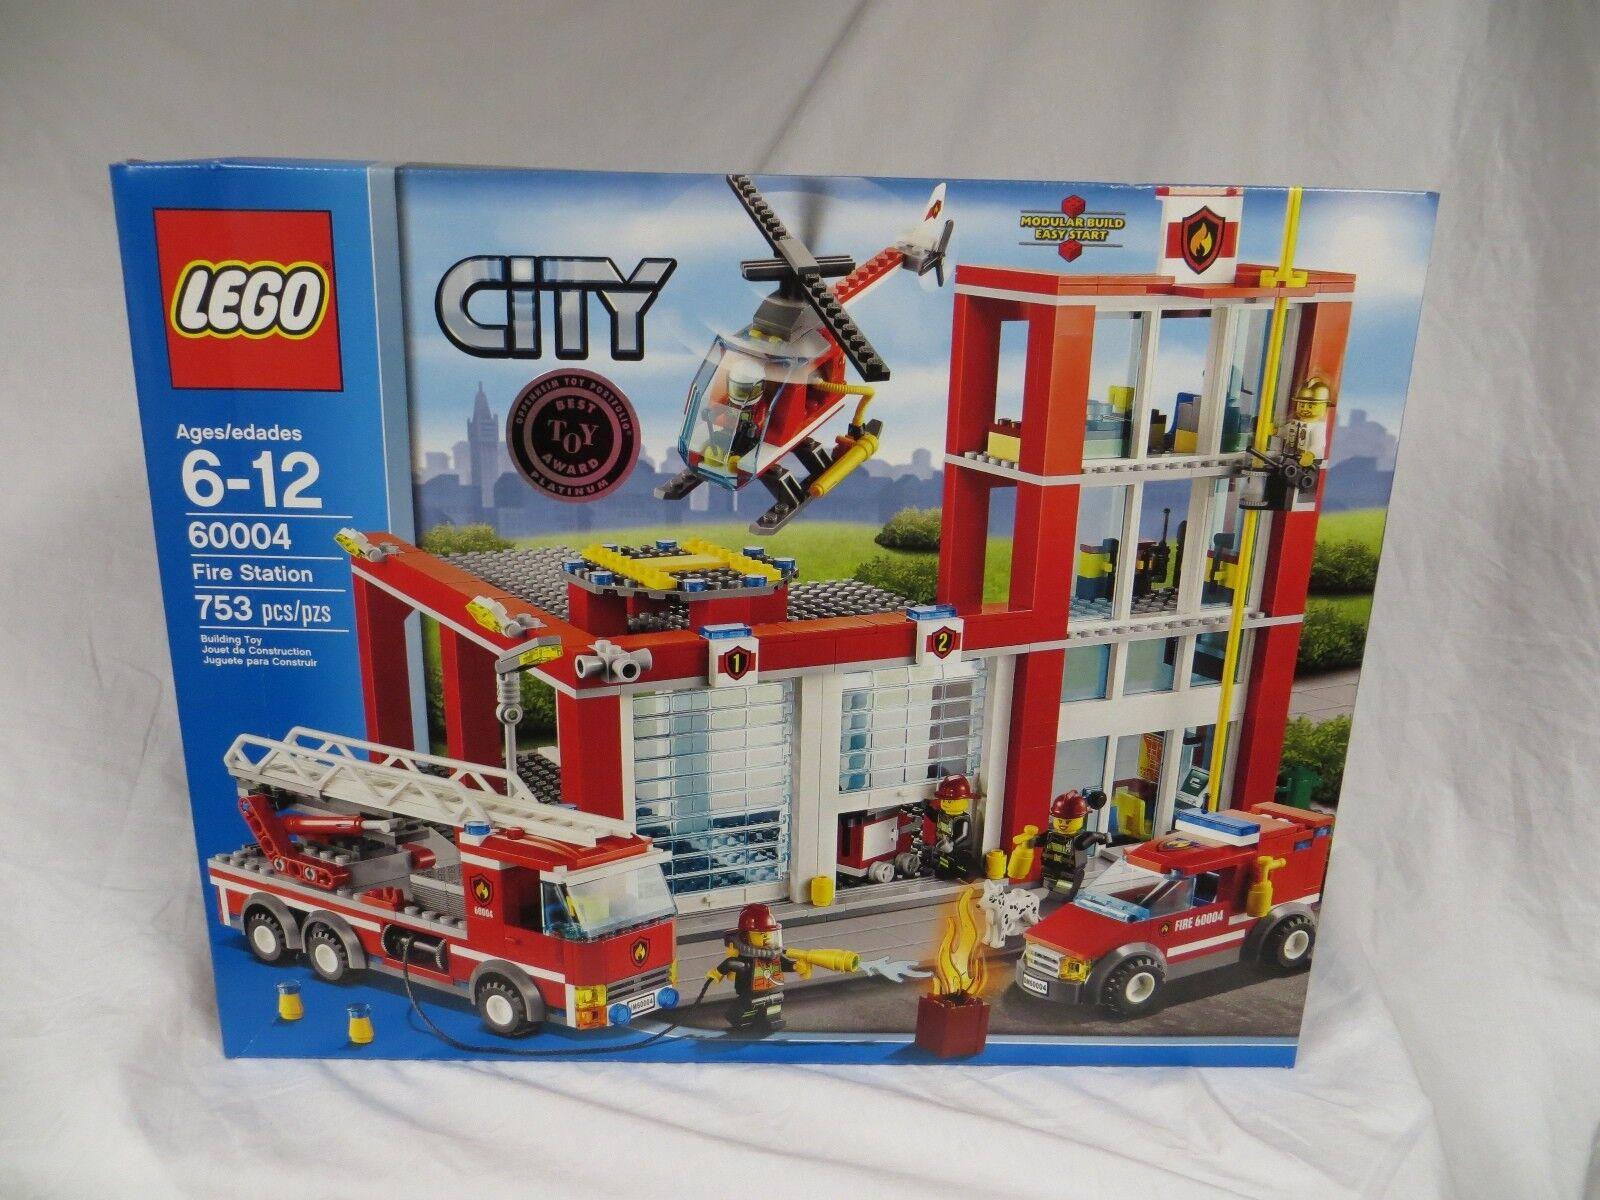 Lego città 60004 Fire Station  BRe nuovo Factory SEALED RETIrosso Set  comprare sconti